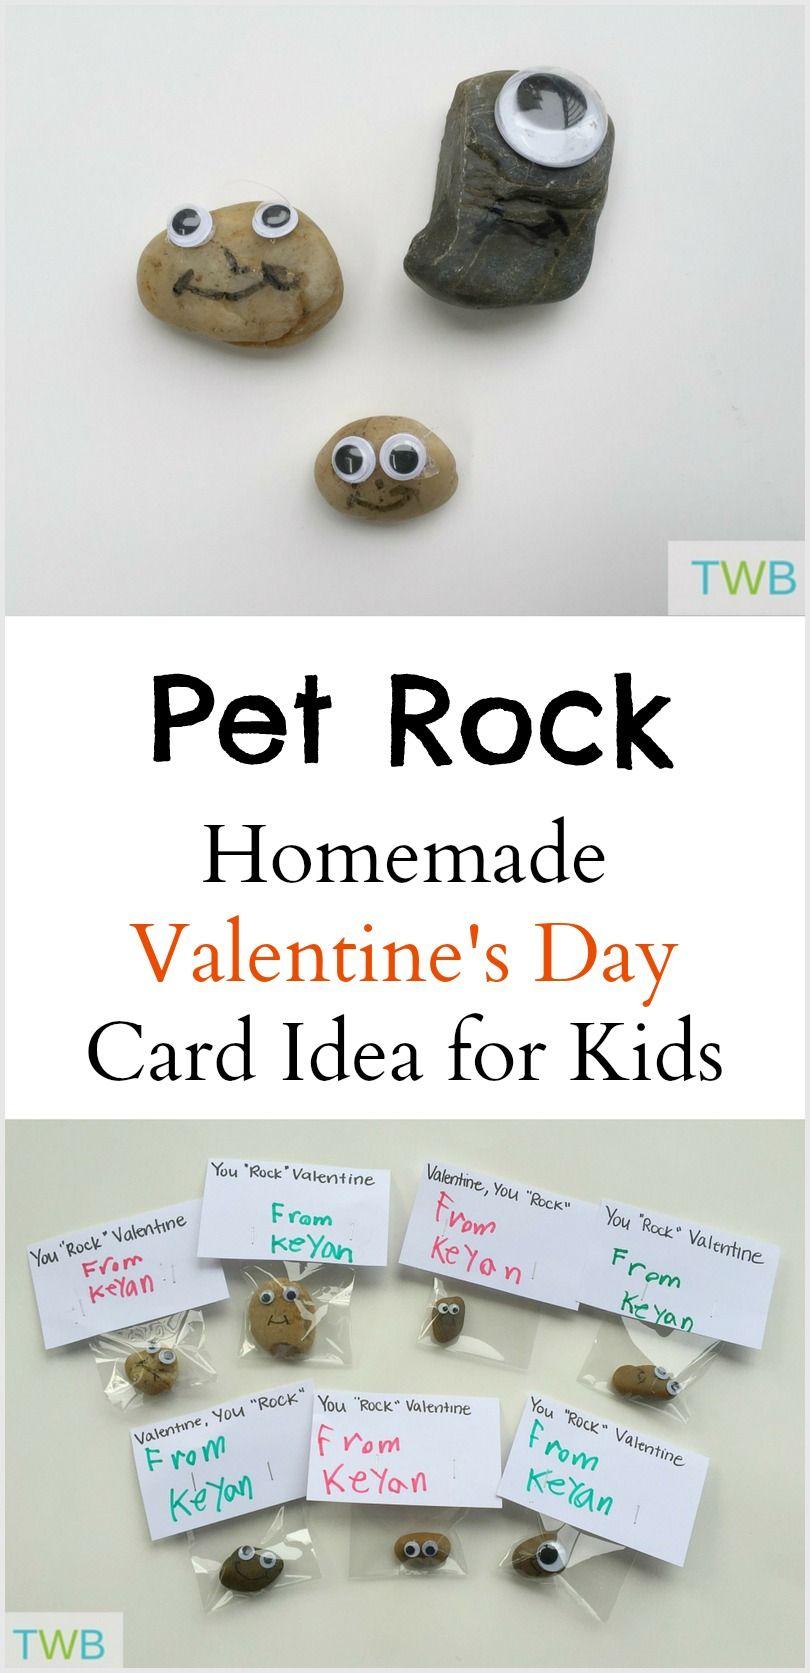 Homemade Valentine Cards for Kids - Pet Rock | Homemade valentine ...